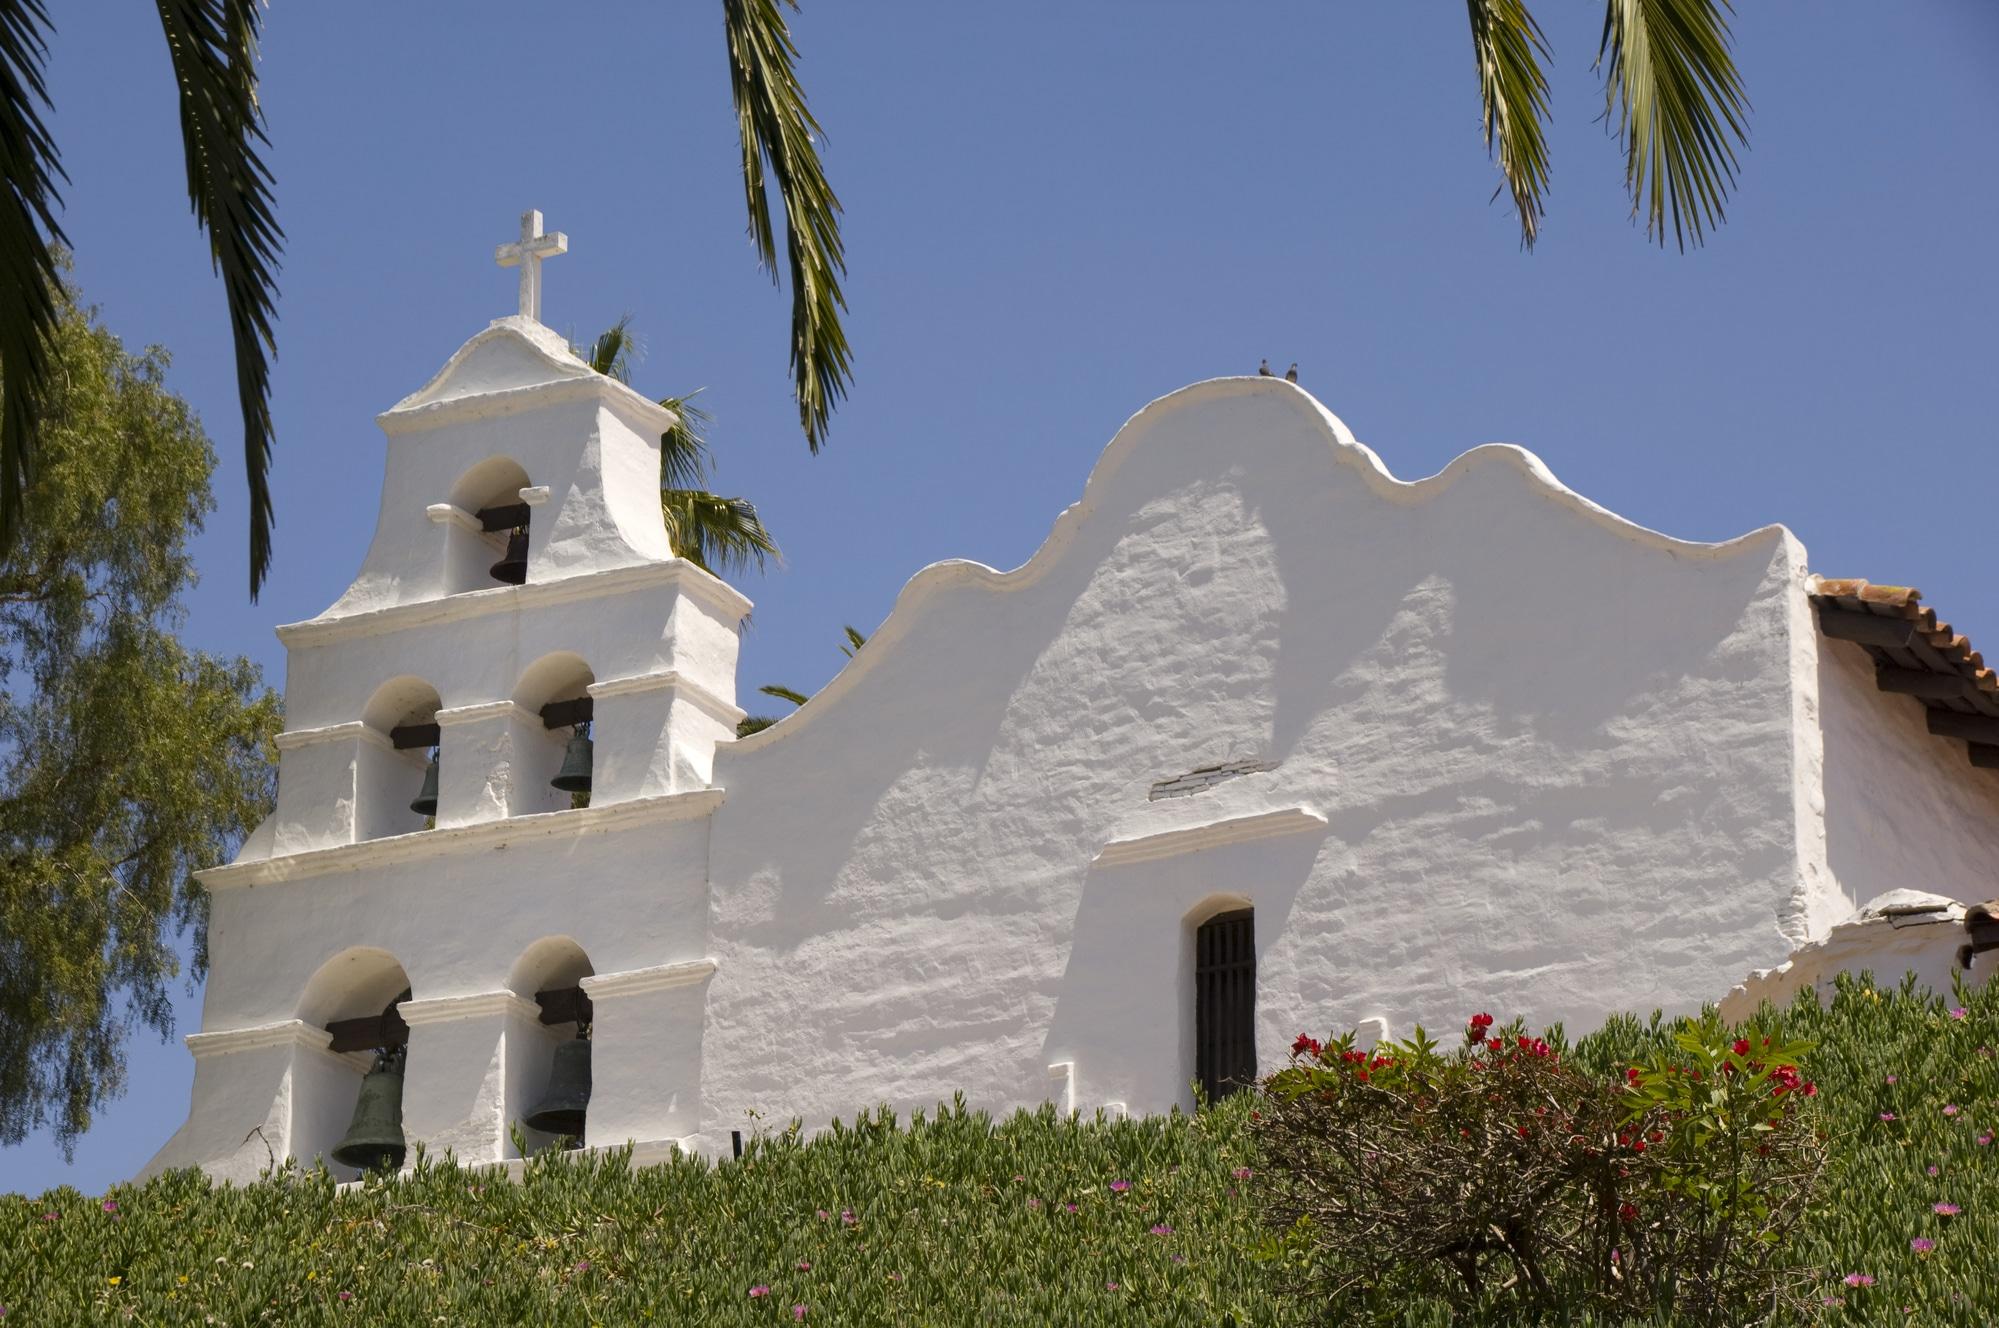 Mission San Diego de Alcala's white stucco facade.